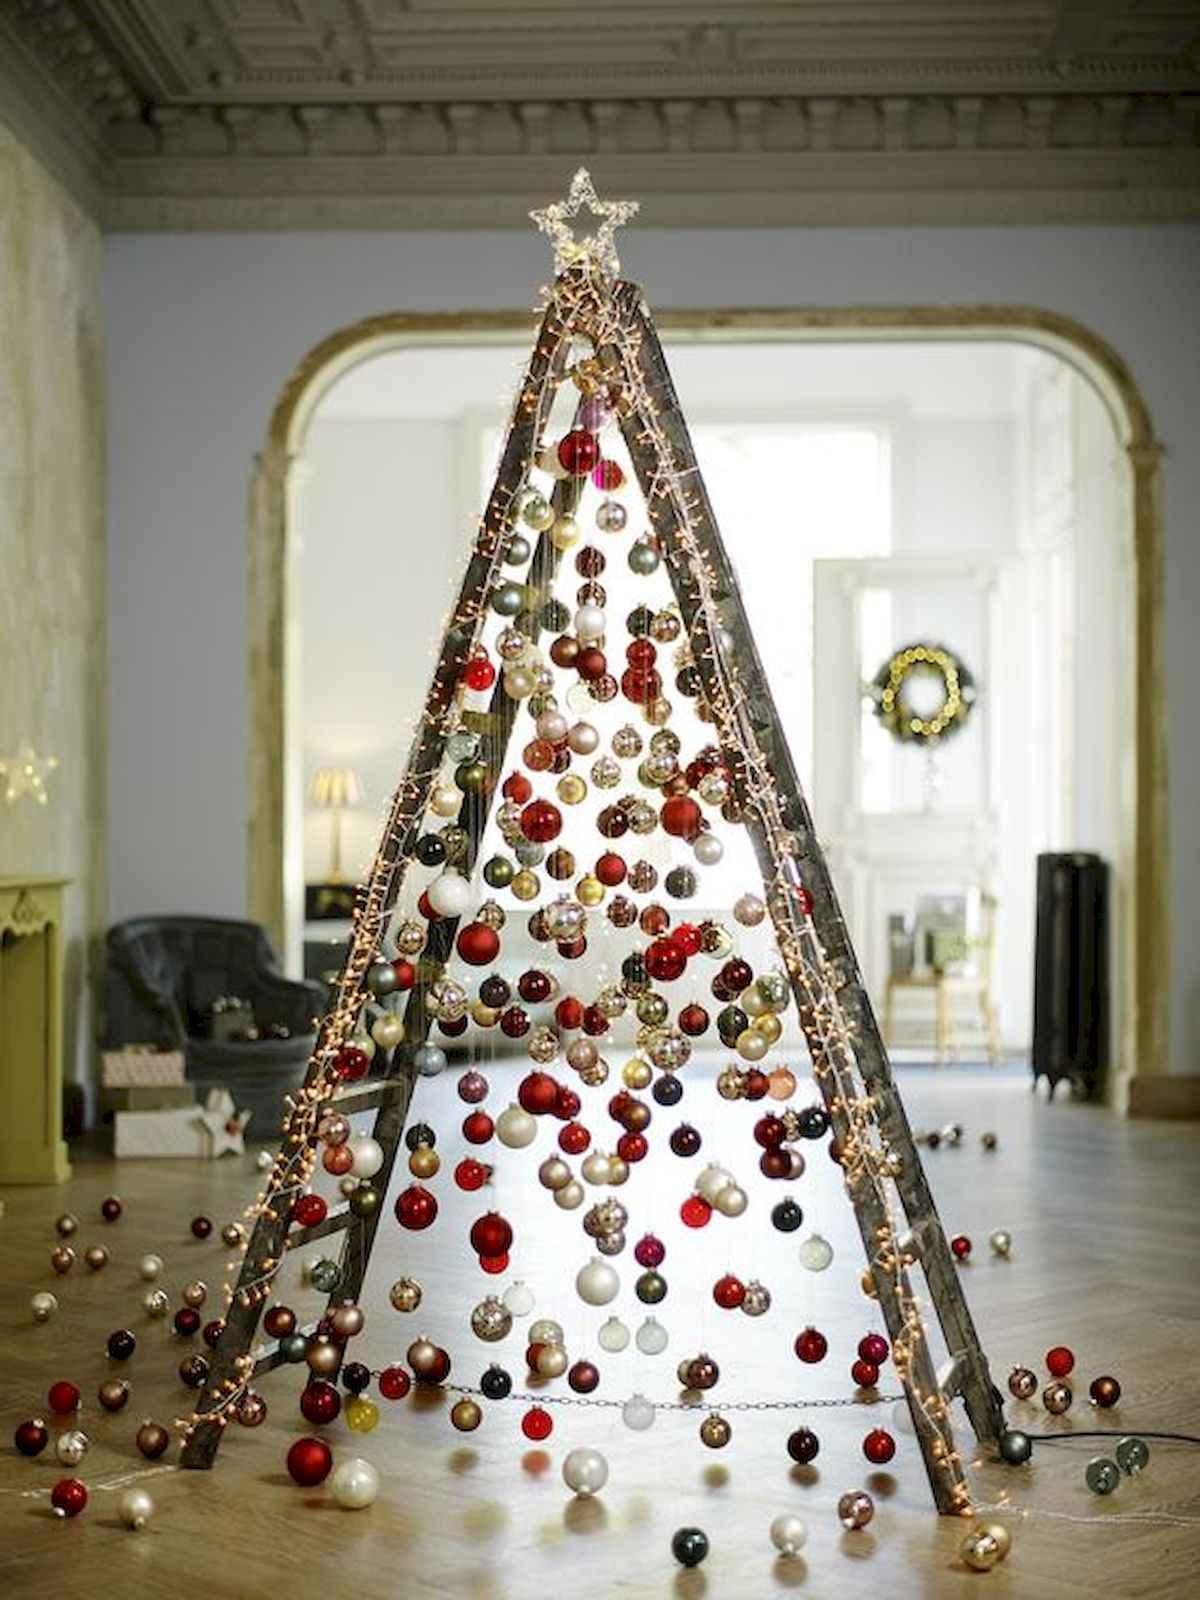 40 unique christmas tree ideas decorations (9)